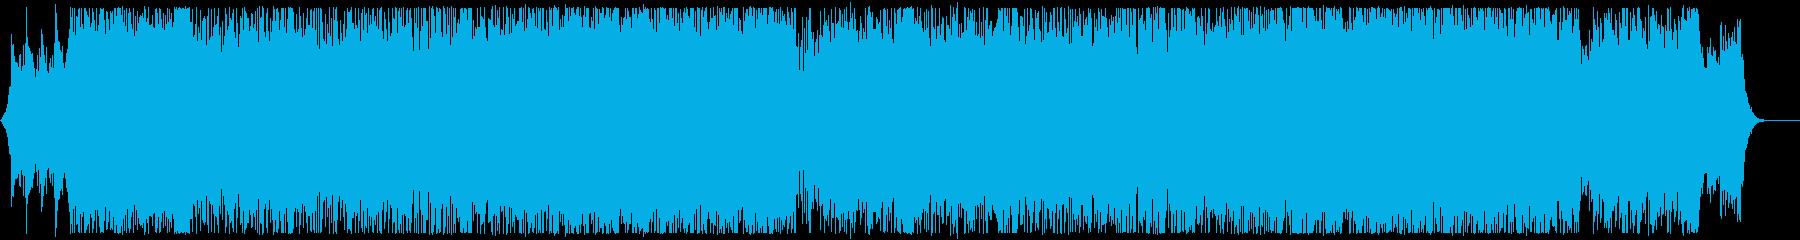 X`mas 結婚式 生アコギベルキラキラの再生済みの波形